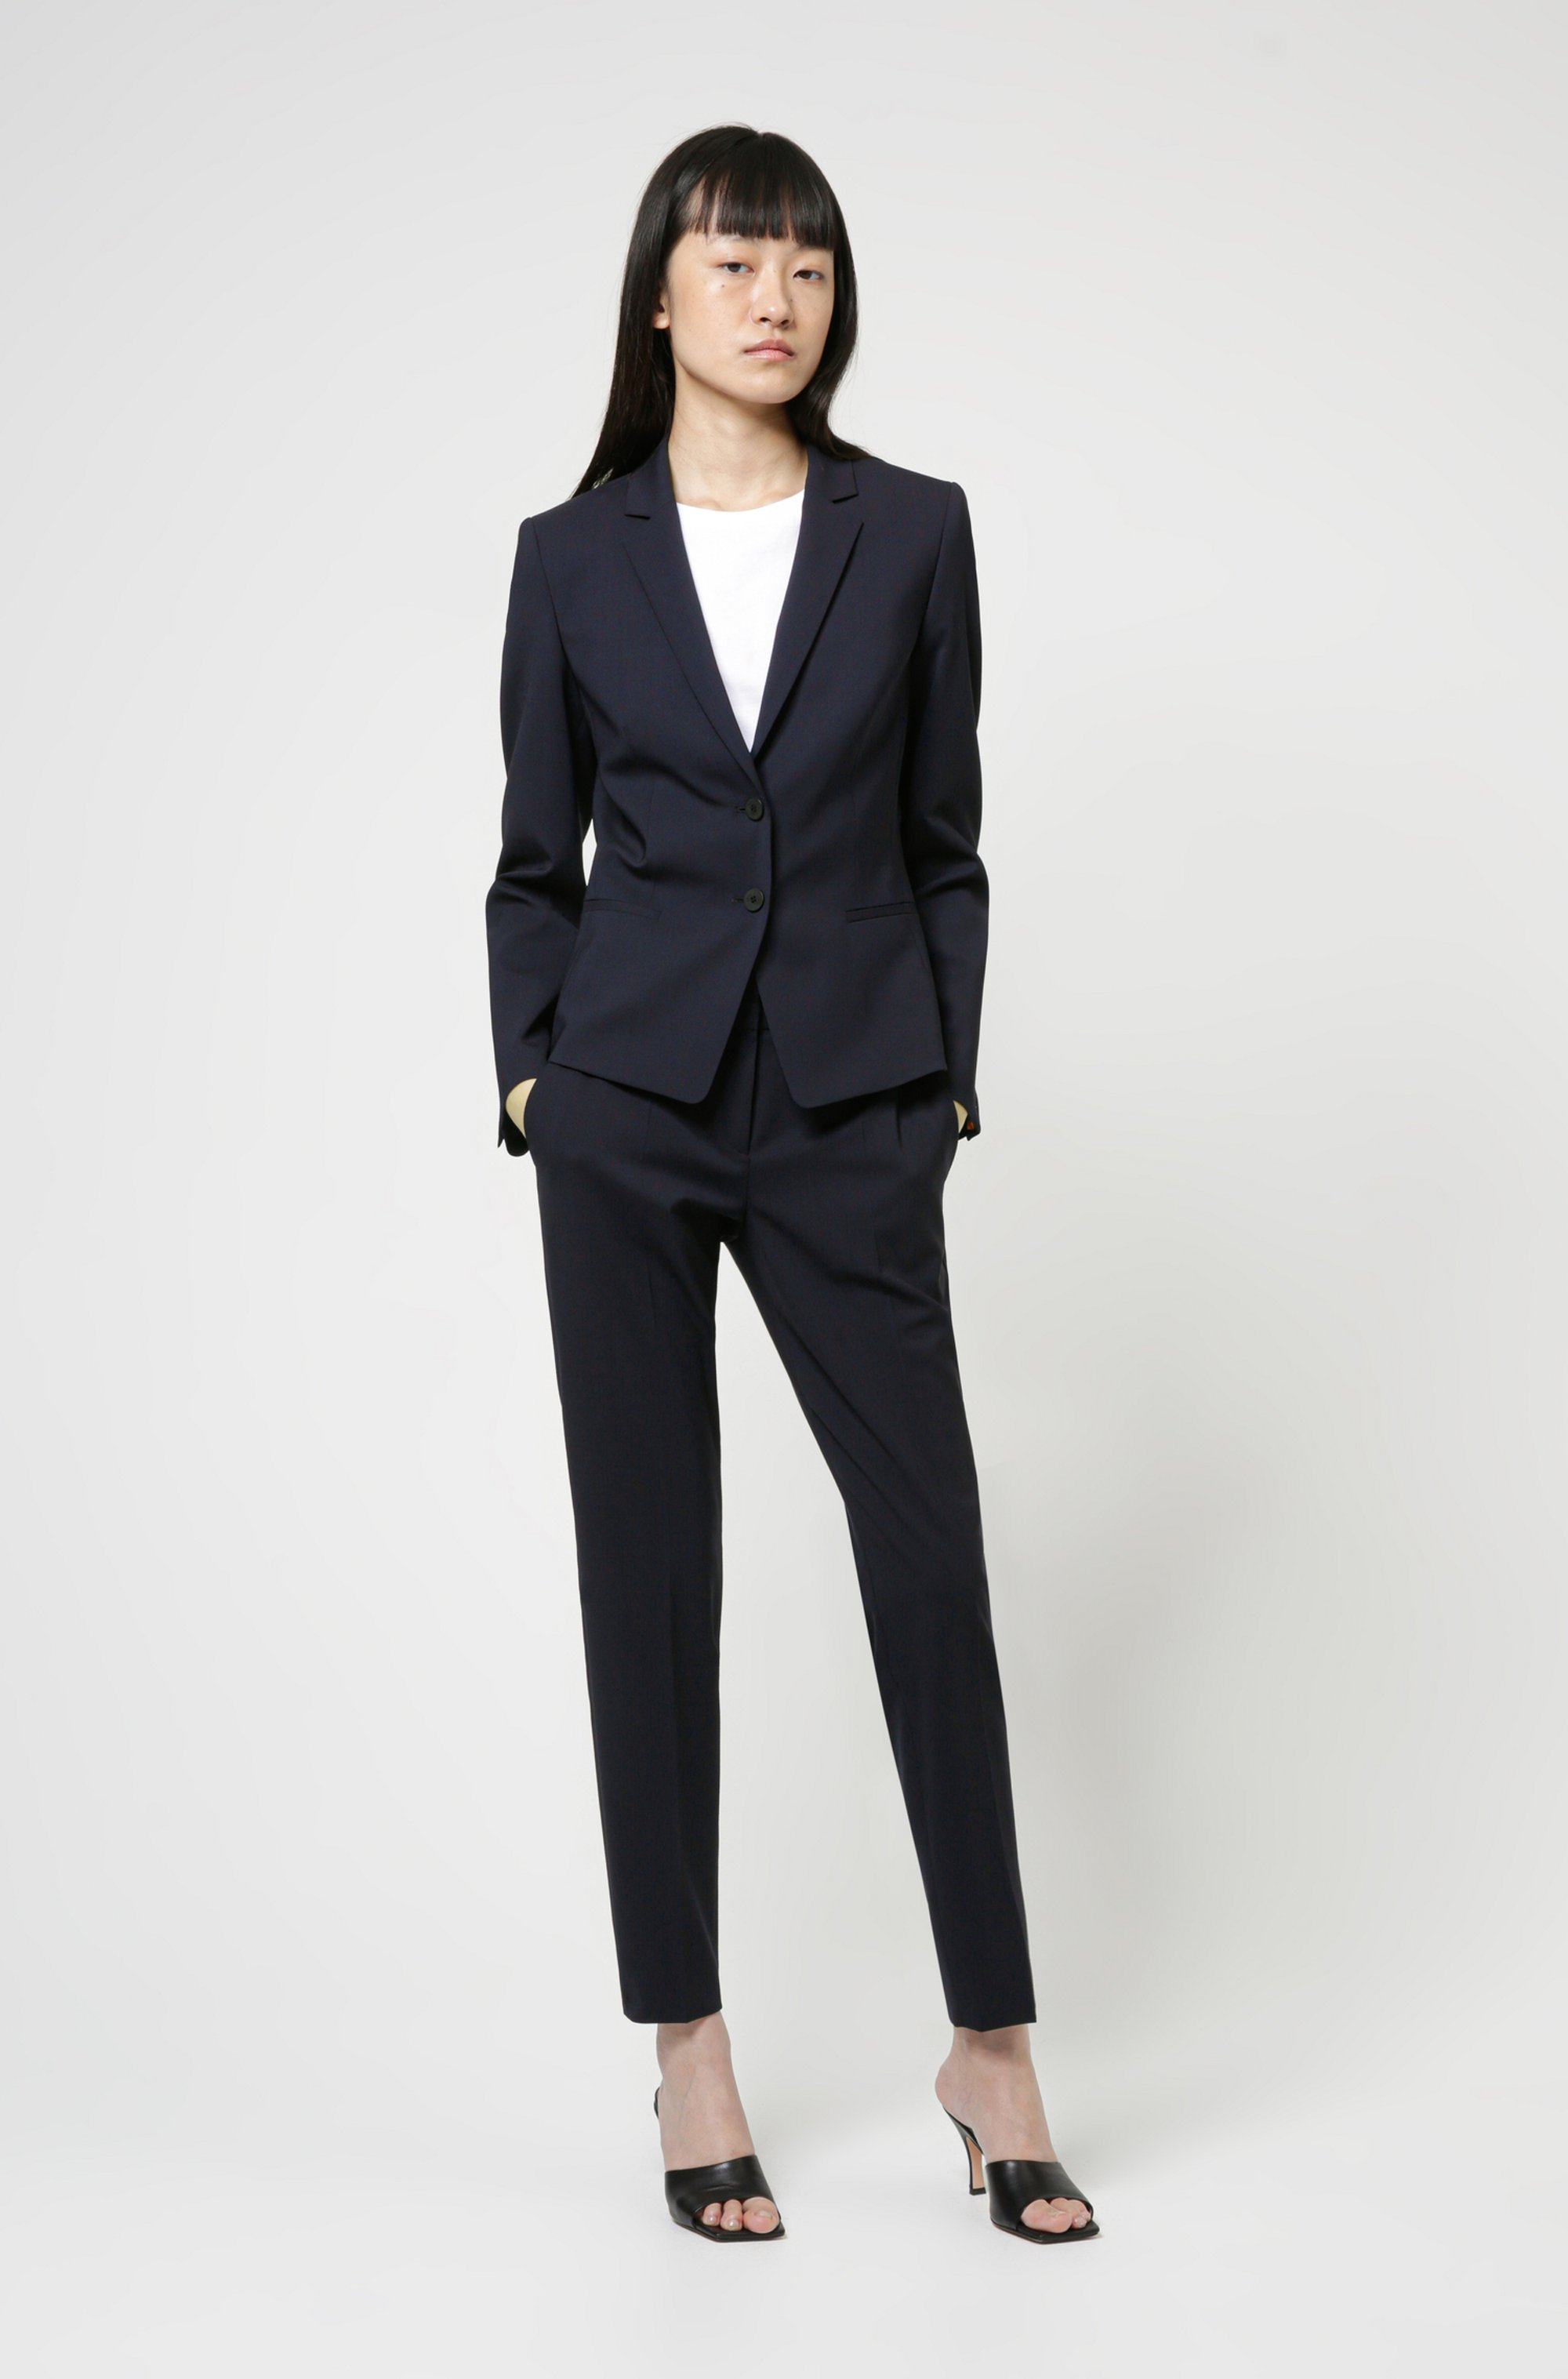 Slim-fit trousers in crease-resistant stretch virgin wool